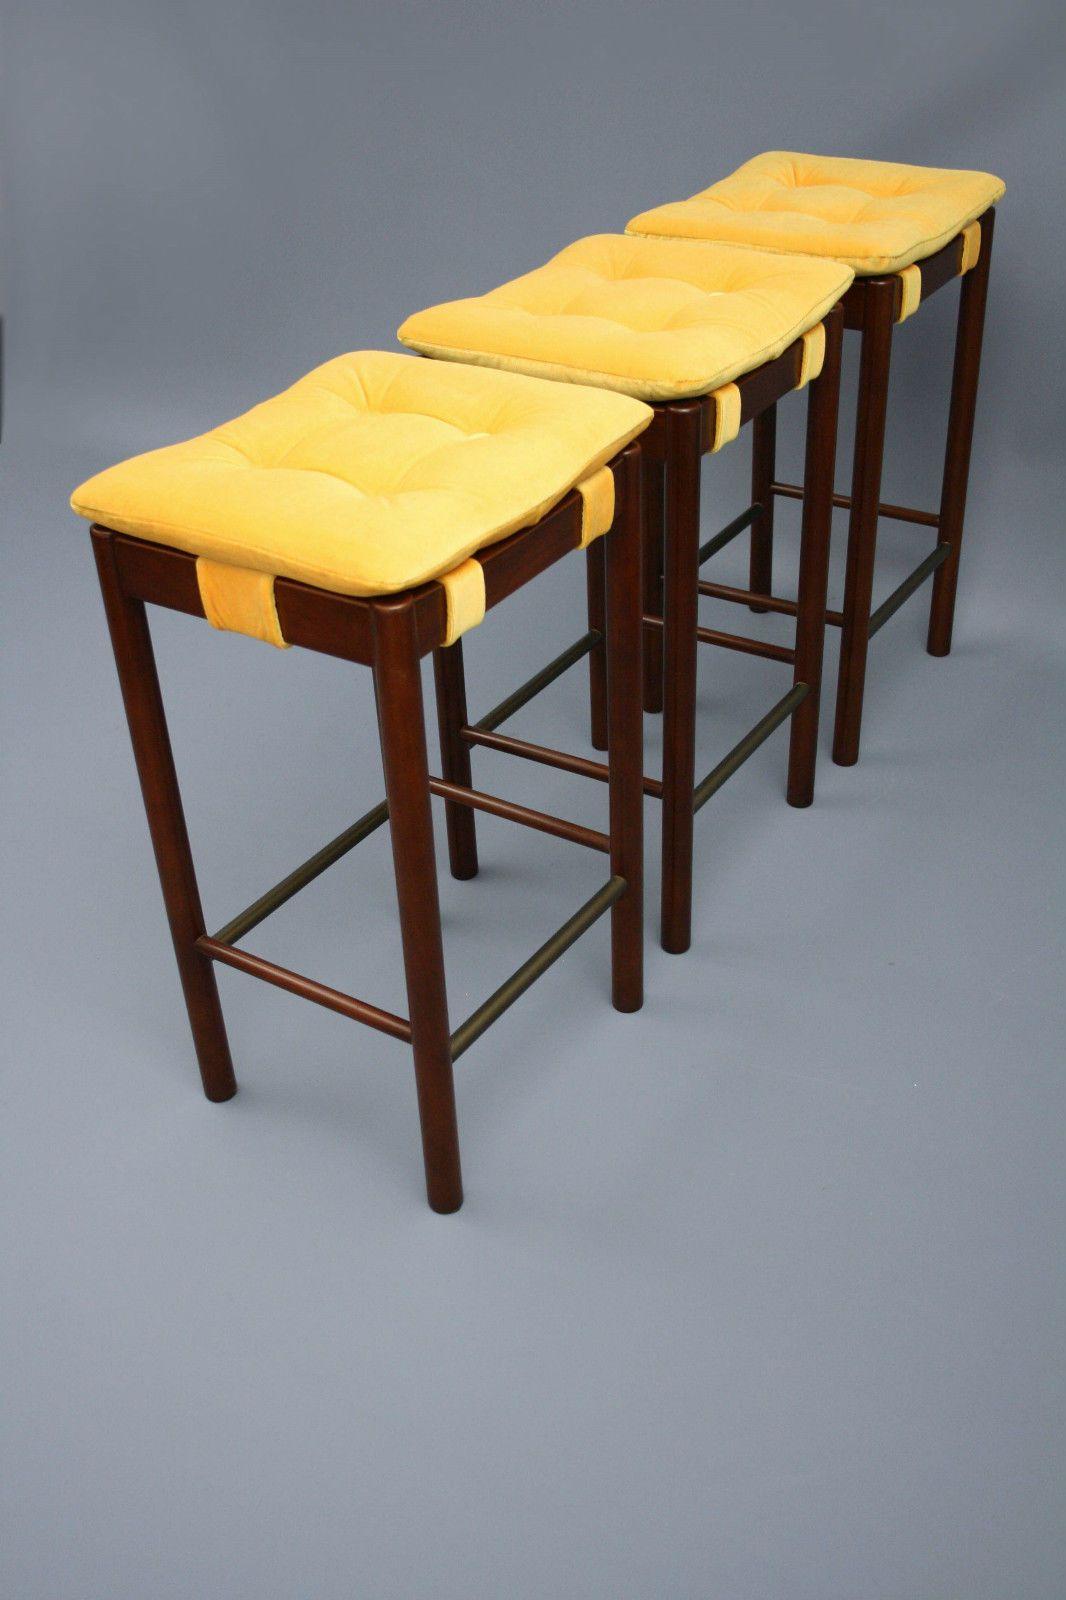 Remarkable Mid Century X 3 Parker Genuine Original Bar Stools Retro Machost Co Dining Chair Design Ideas Machostcouk